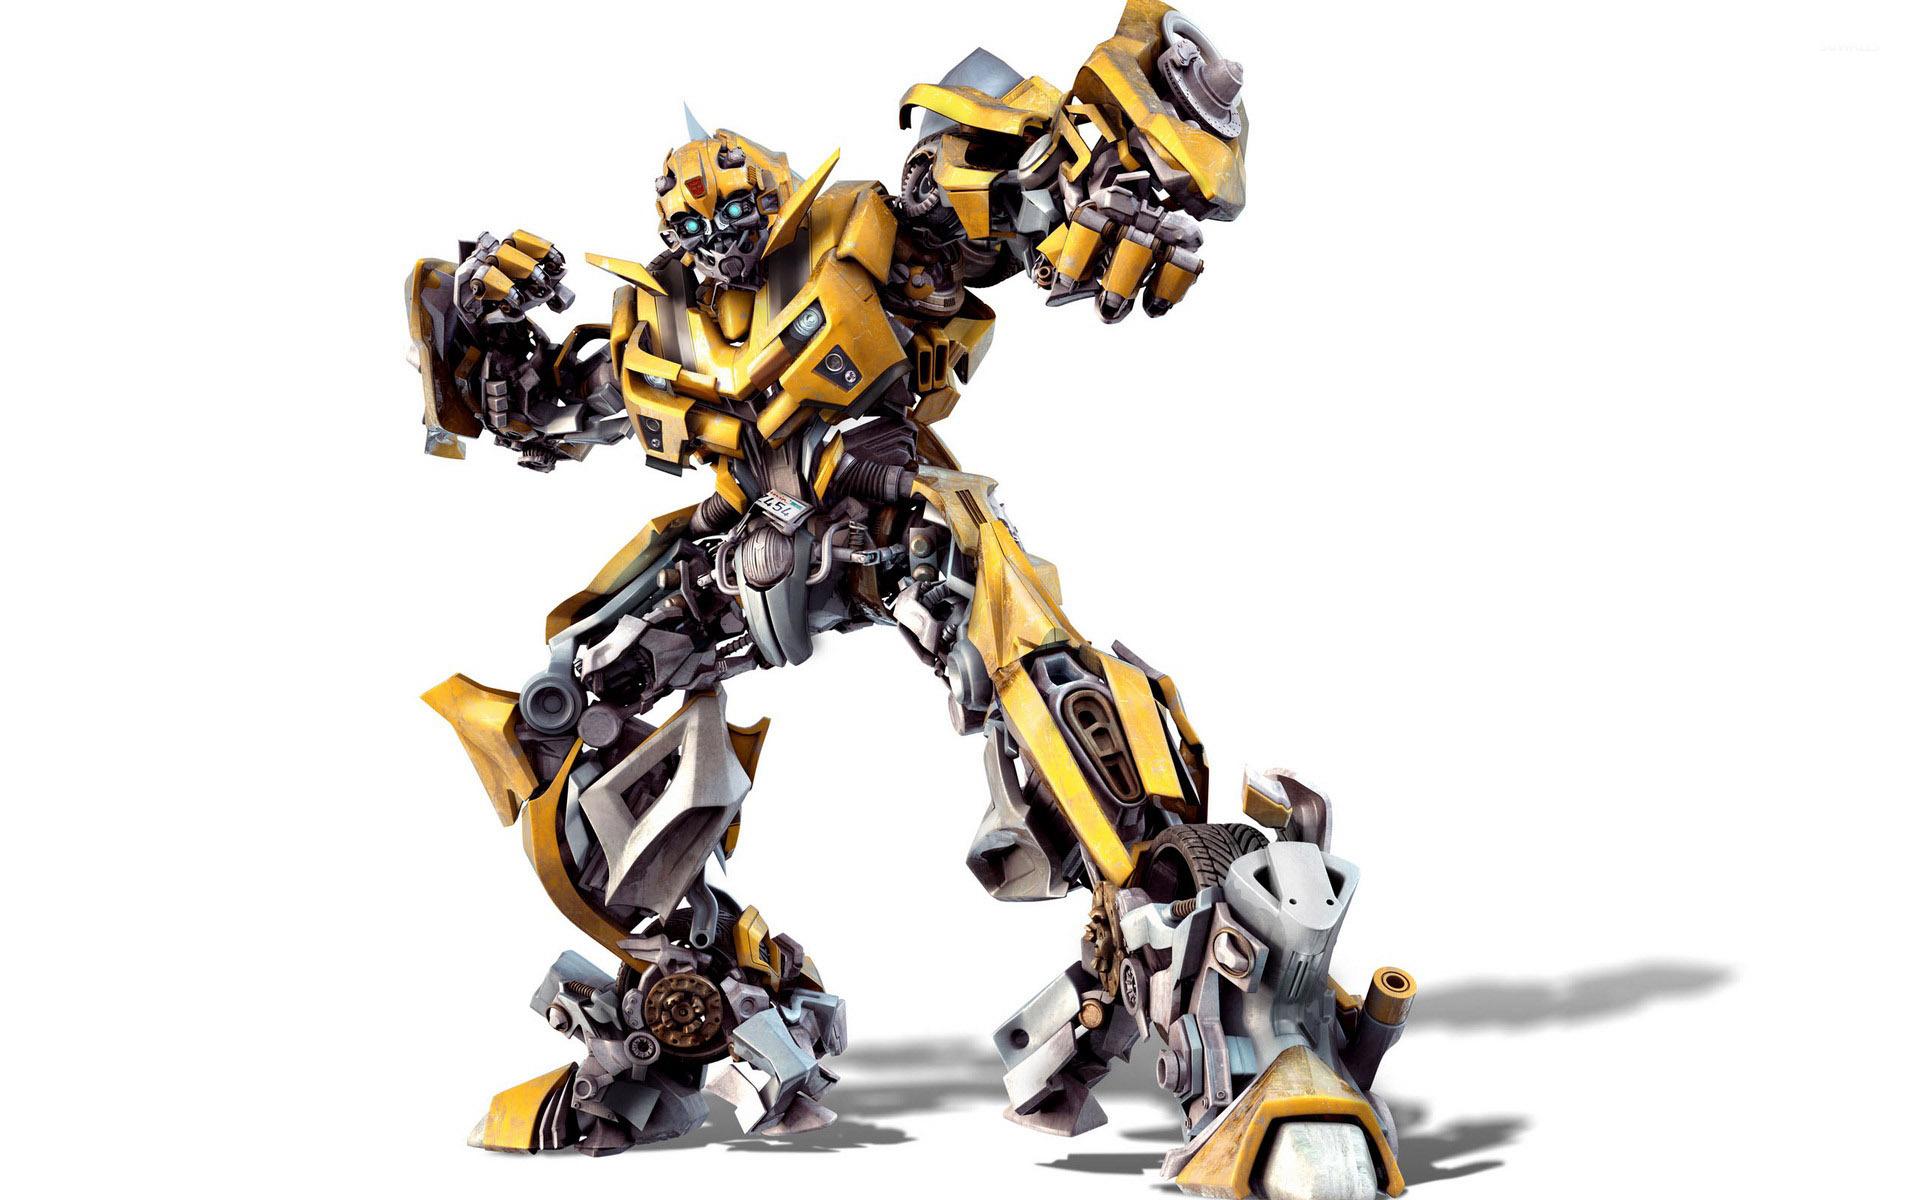 bumblebee transformers 9 wallpaper movie wallpapers 34405. Black Bedroom Furniture Sets. Home Design Ideas